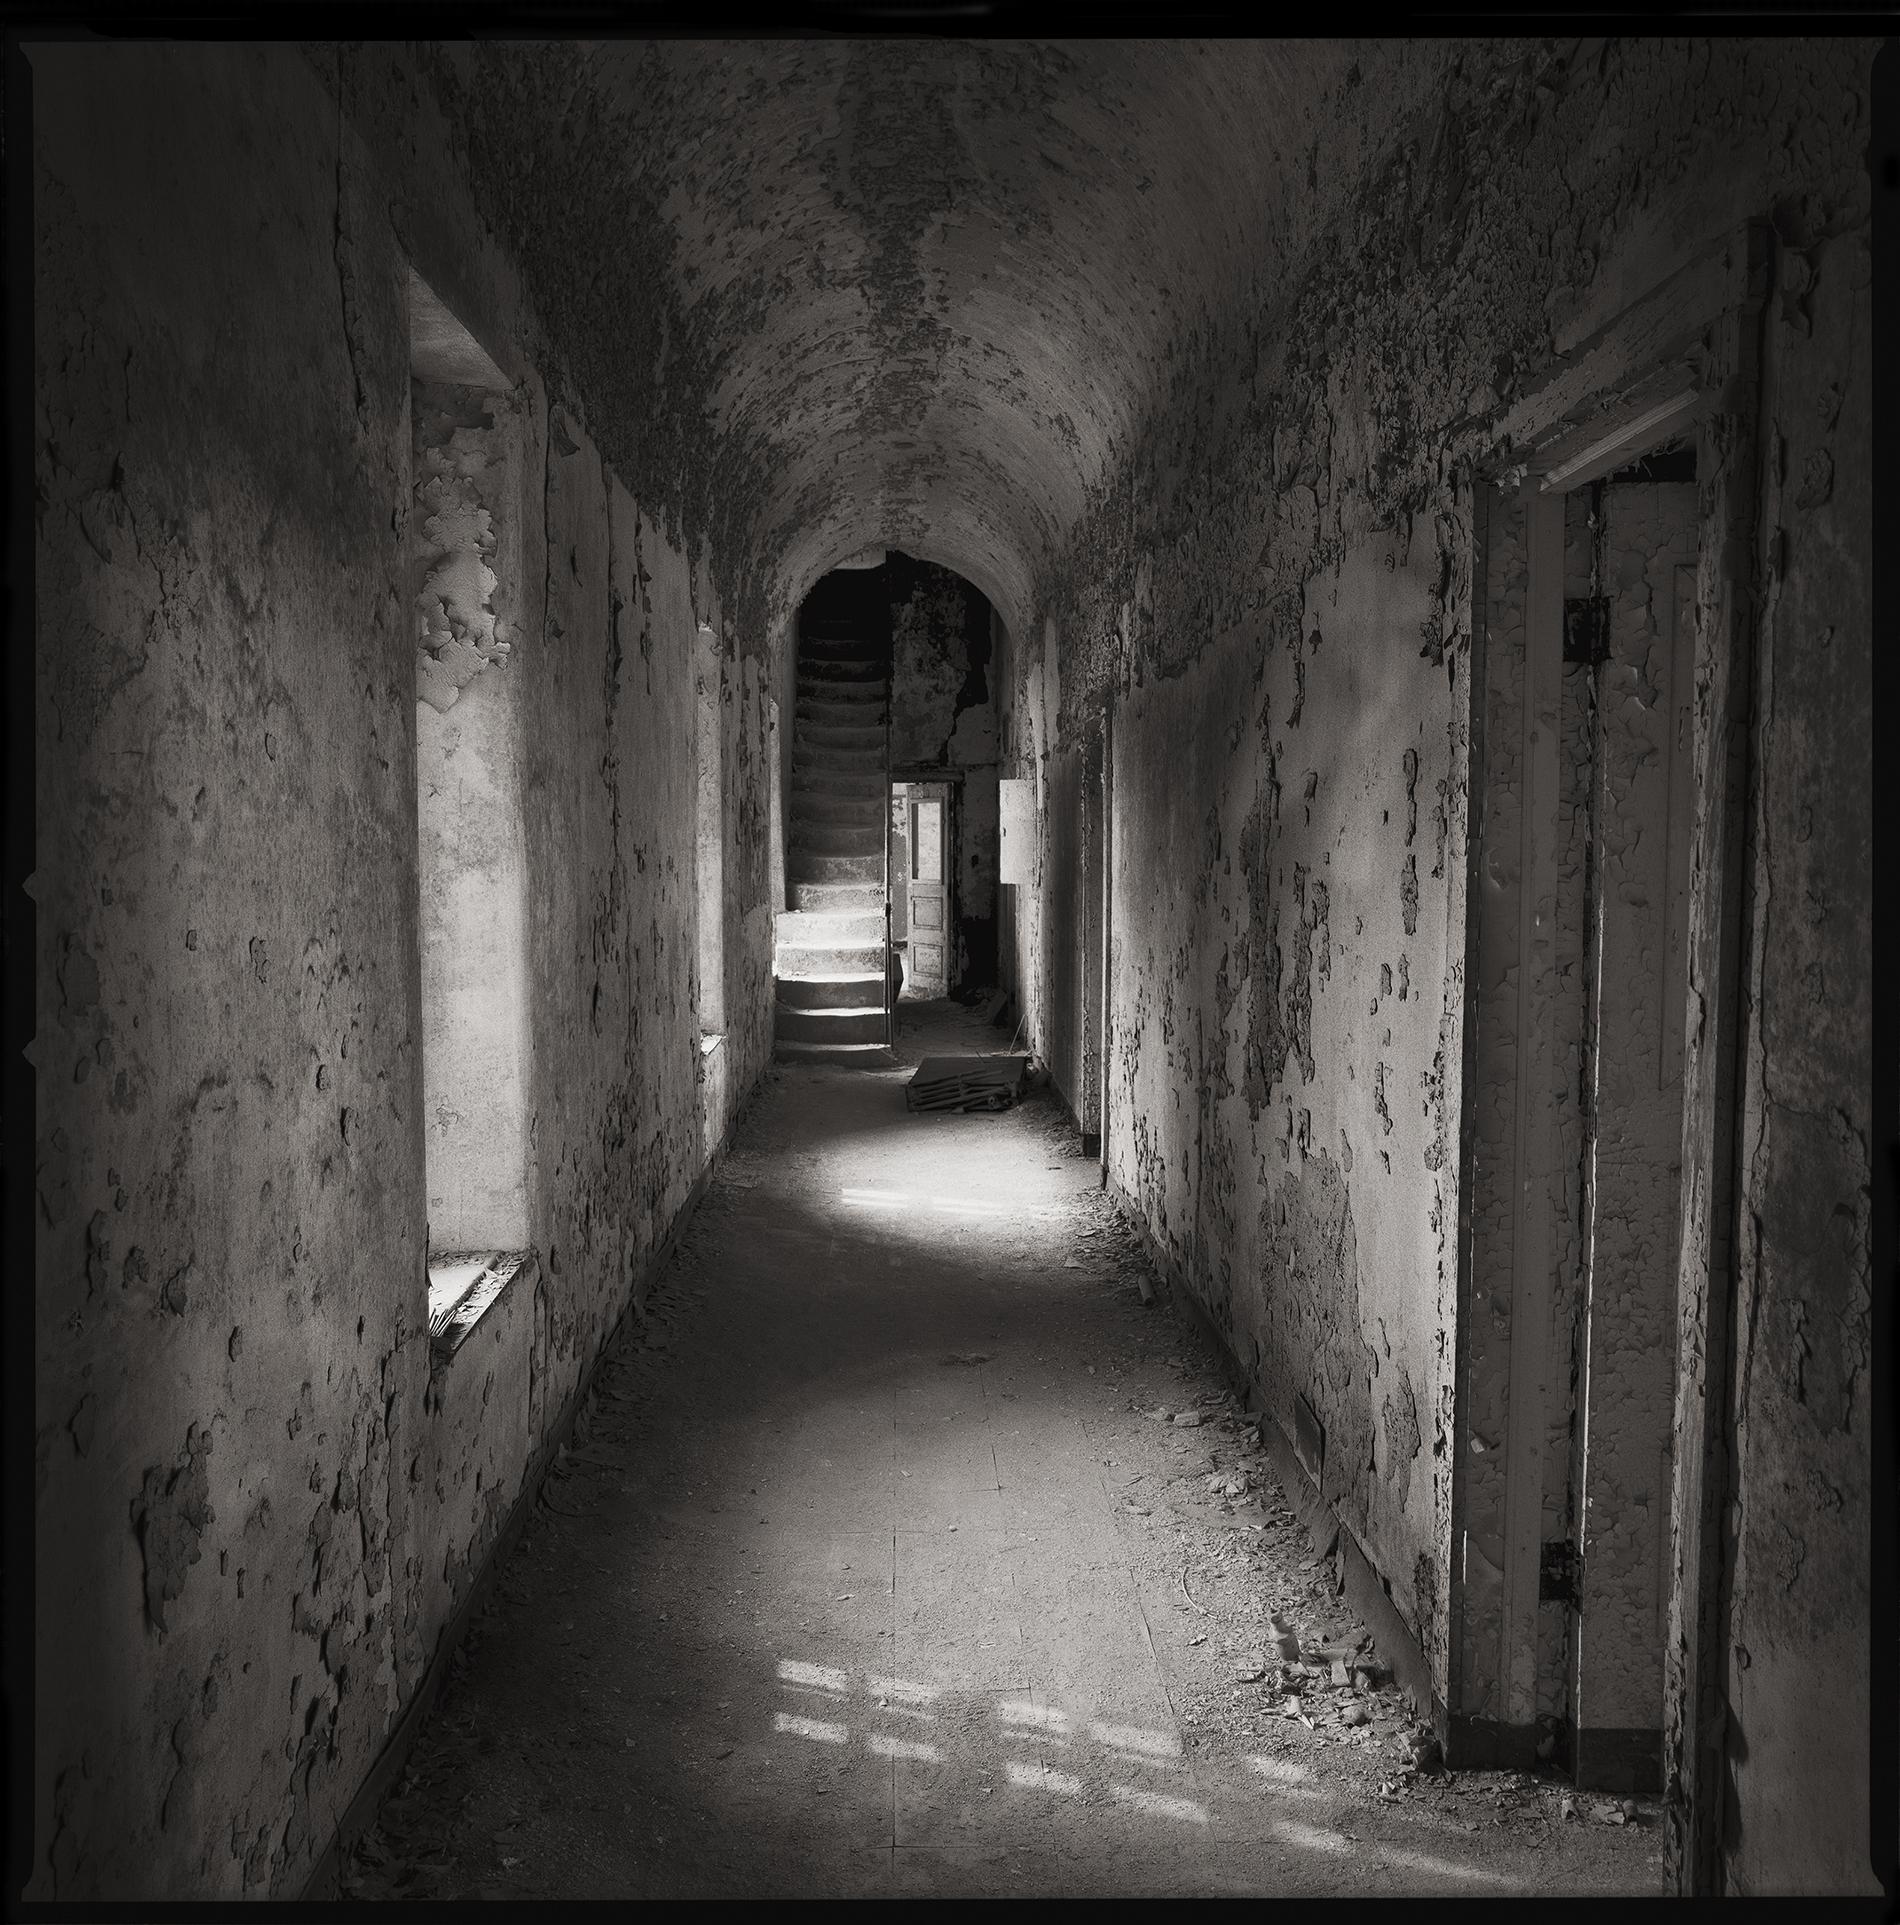 Warden's Corridor